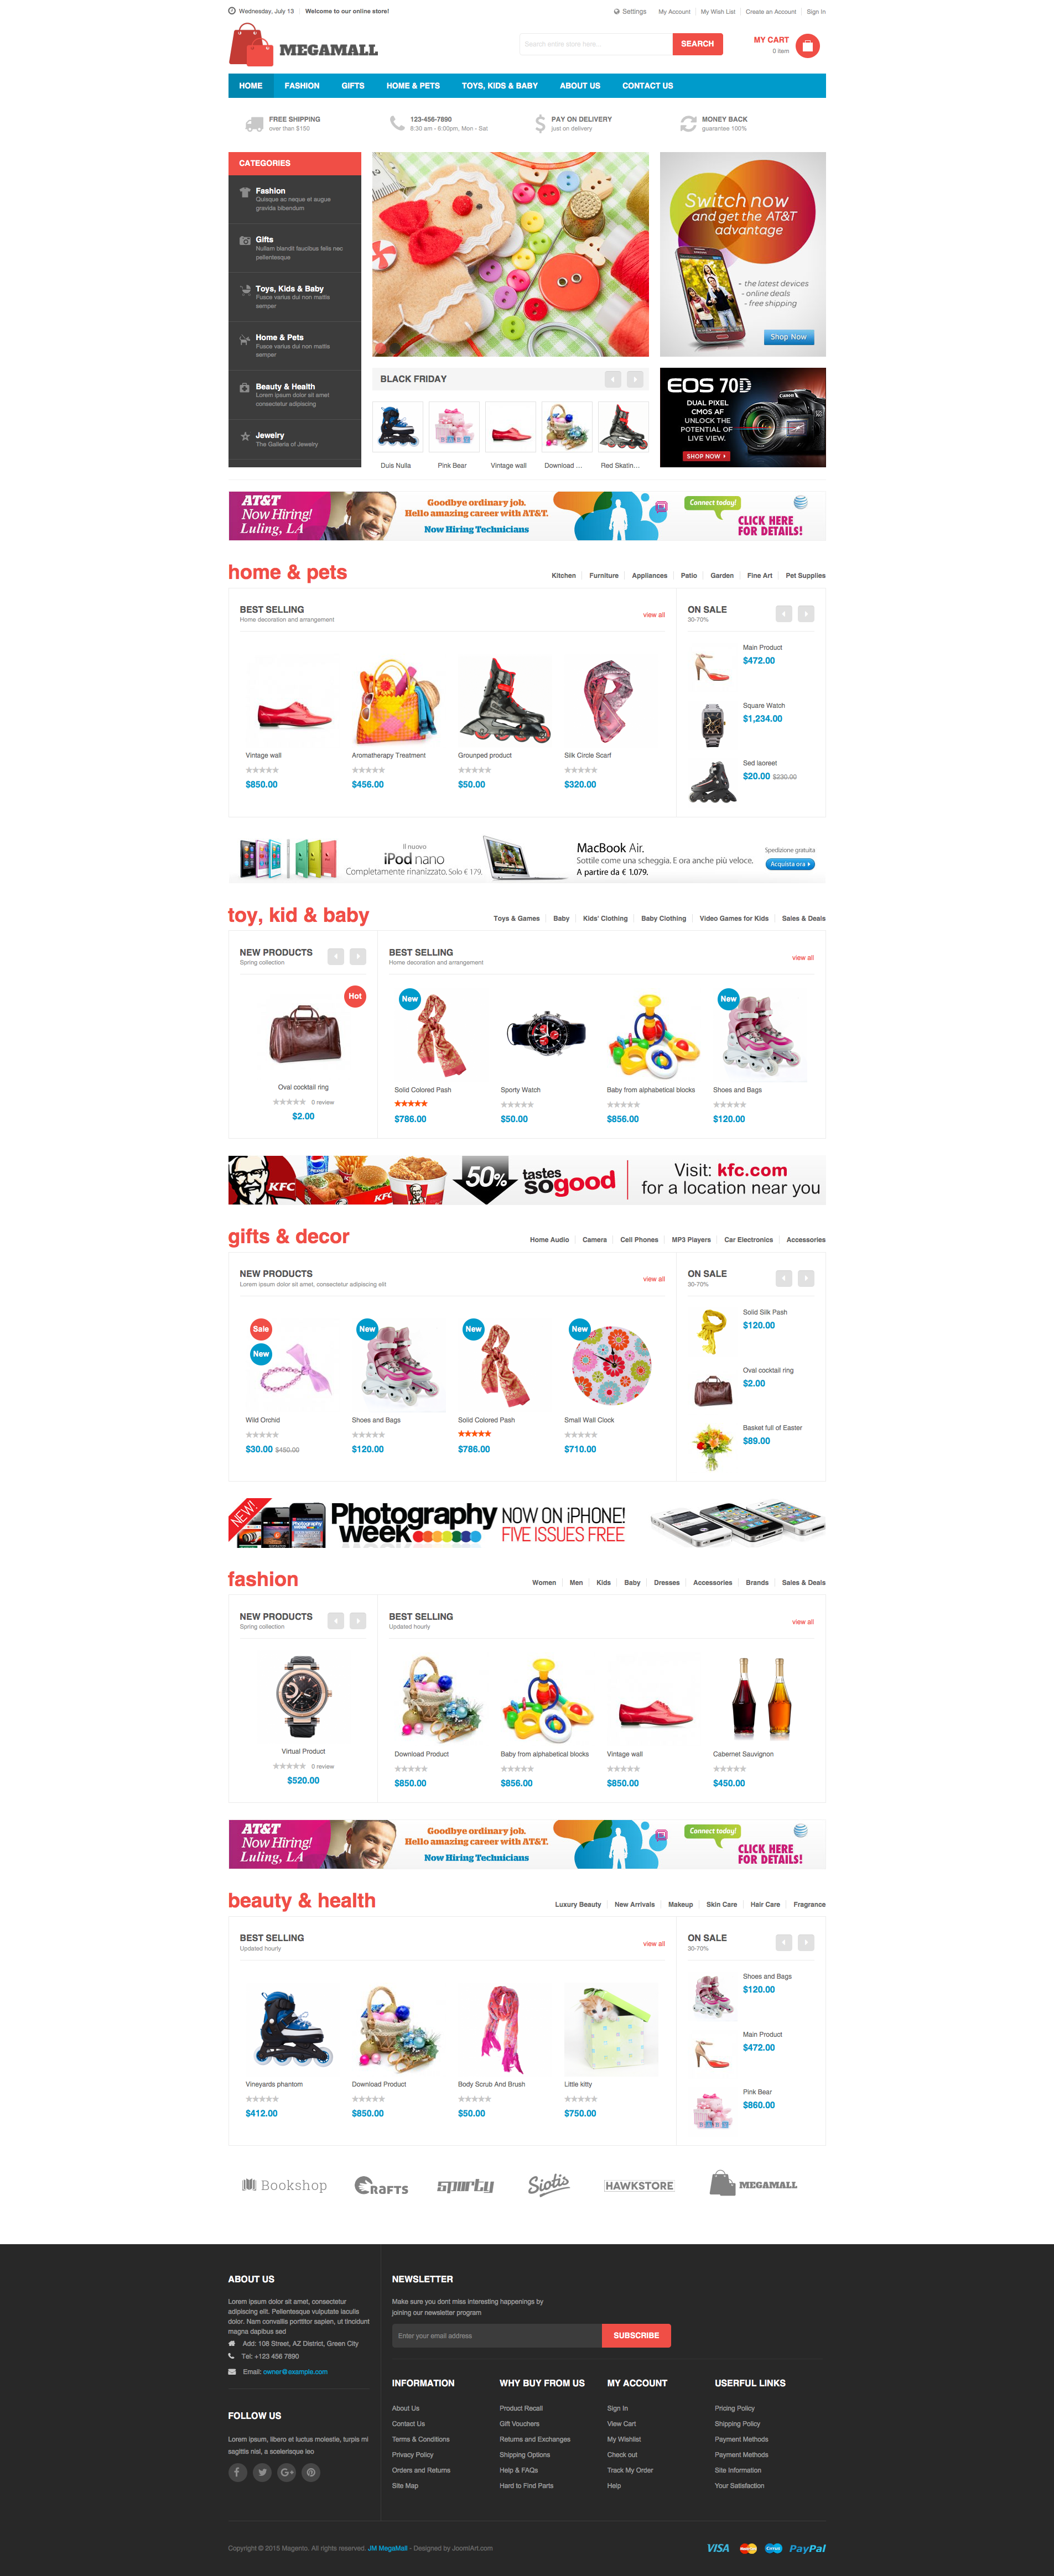 Magento 2 theme - UB MegaMall Homepage